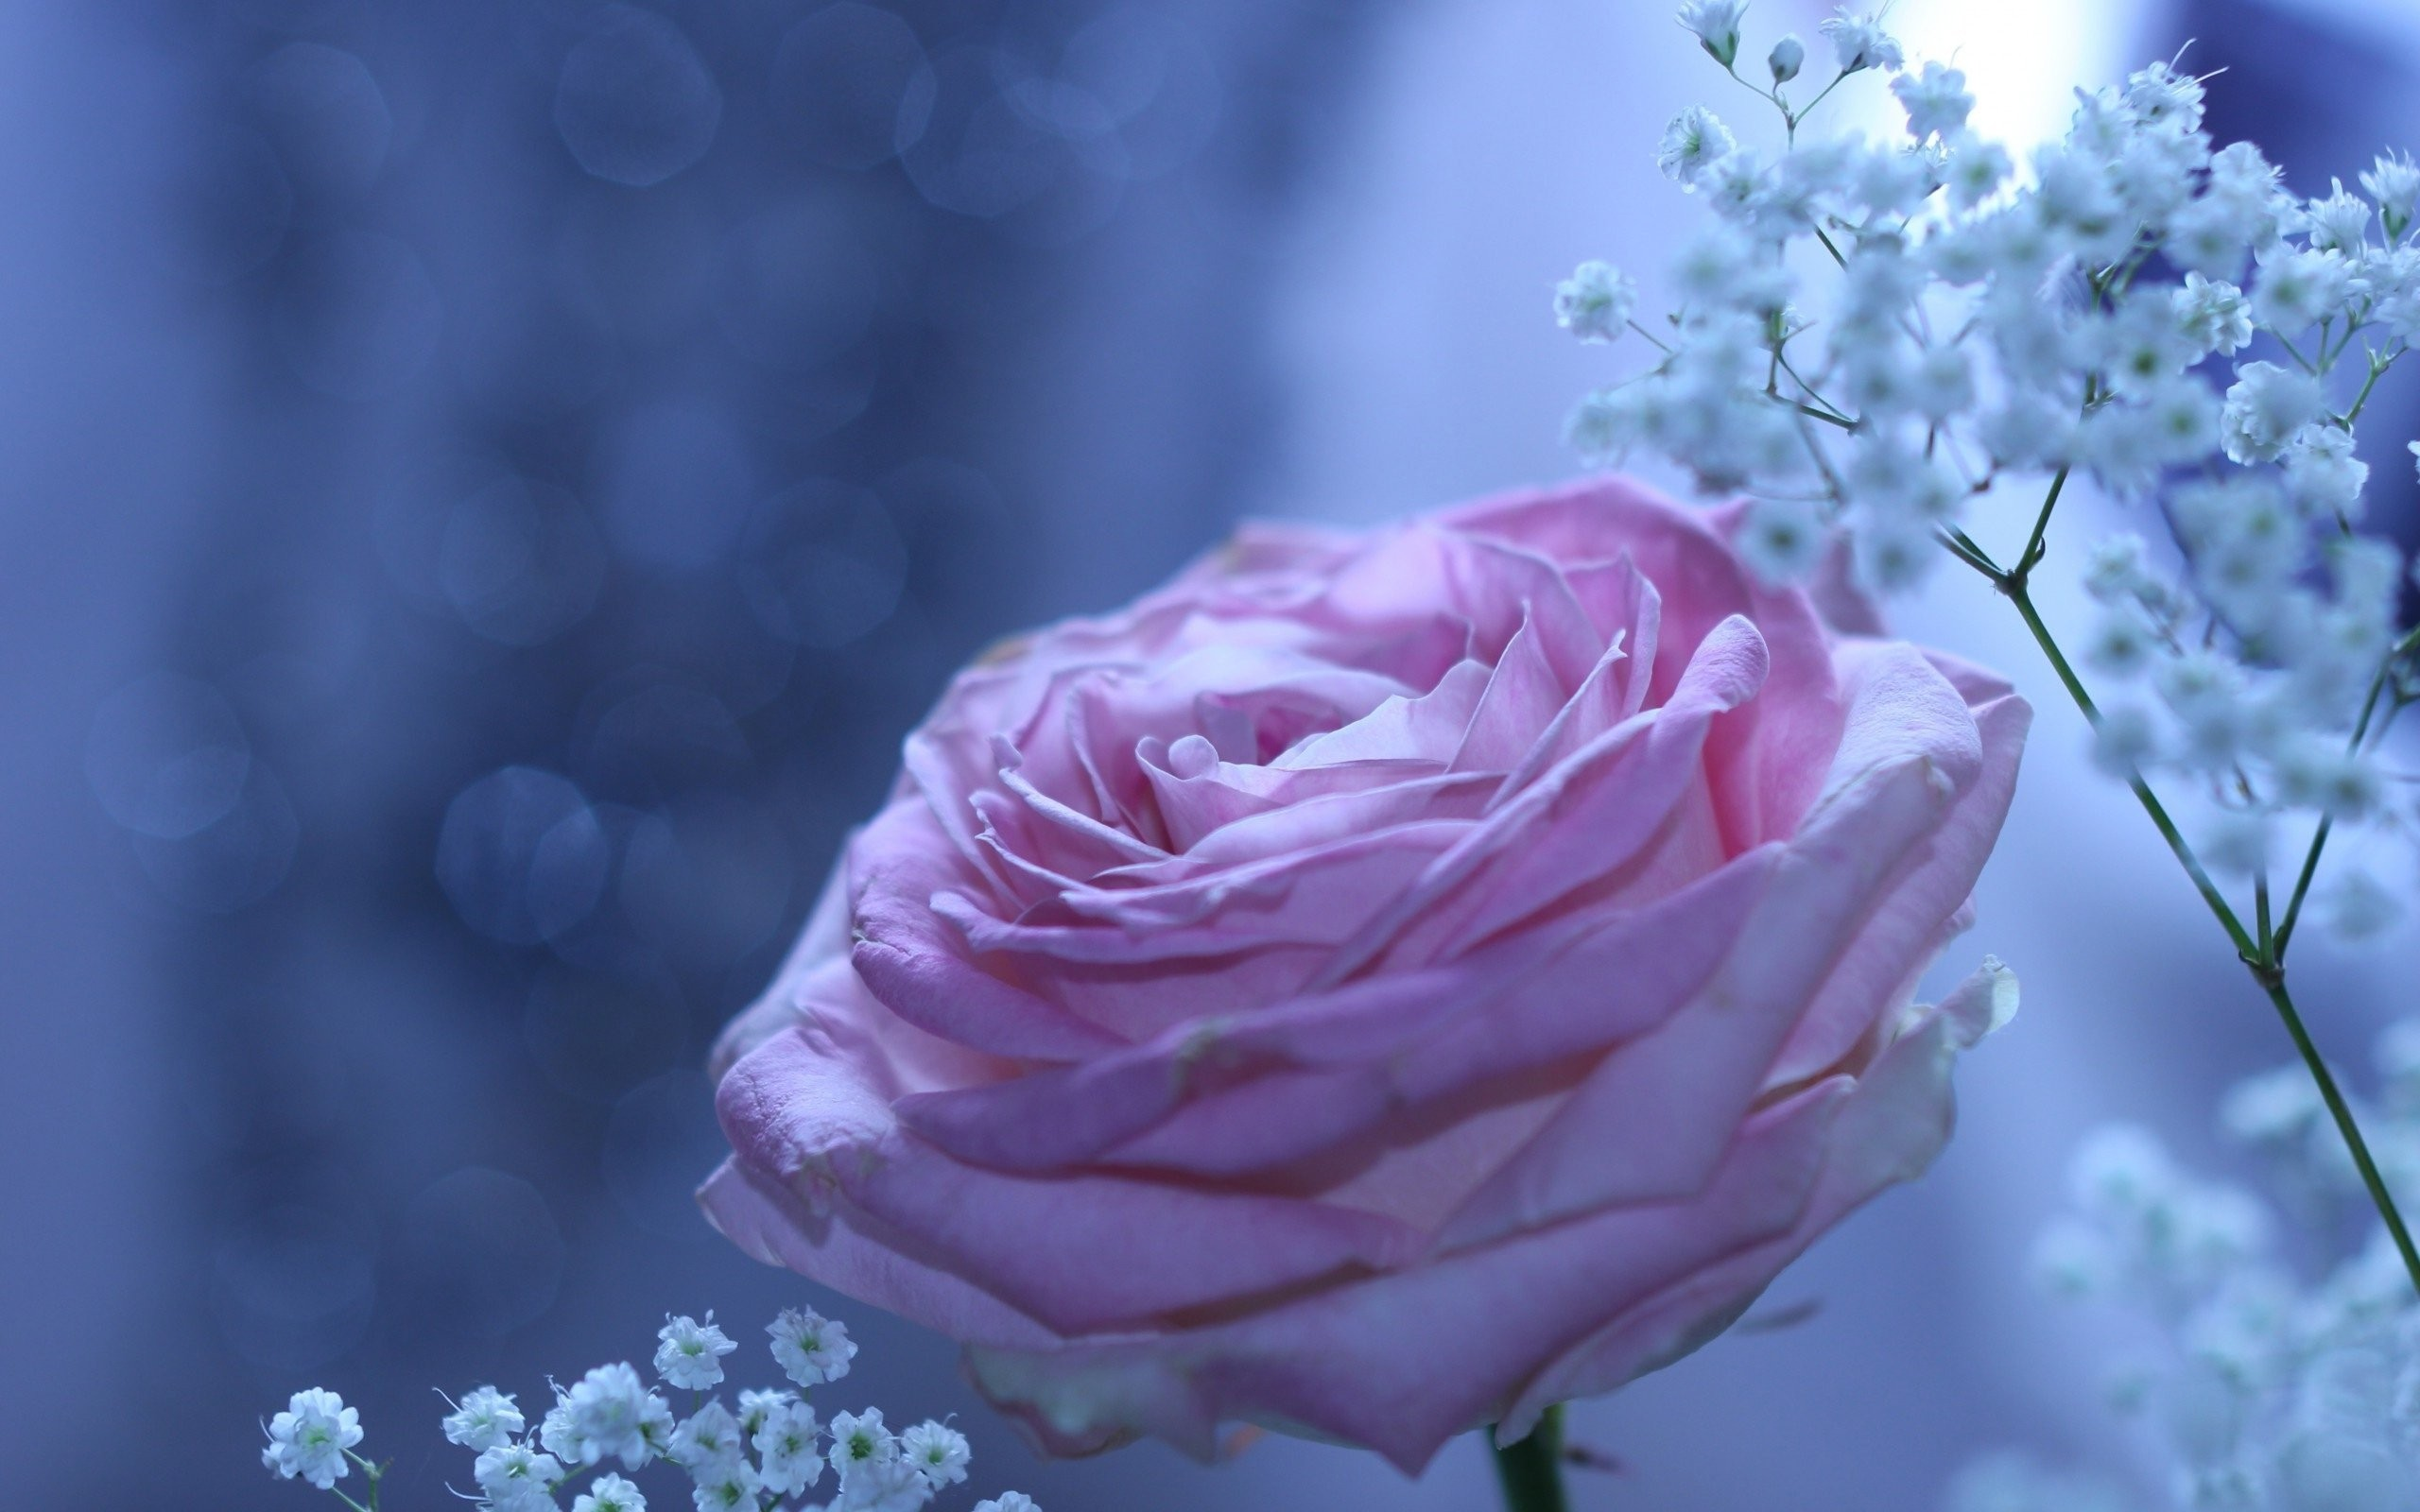 Smells,rose, Beautiful, Flower, Wallpaper,cool Images, - Unique Beautiful Roses Wallpaper Hd , HD Wallpaper & Backgrounds